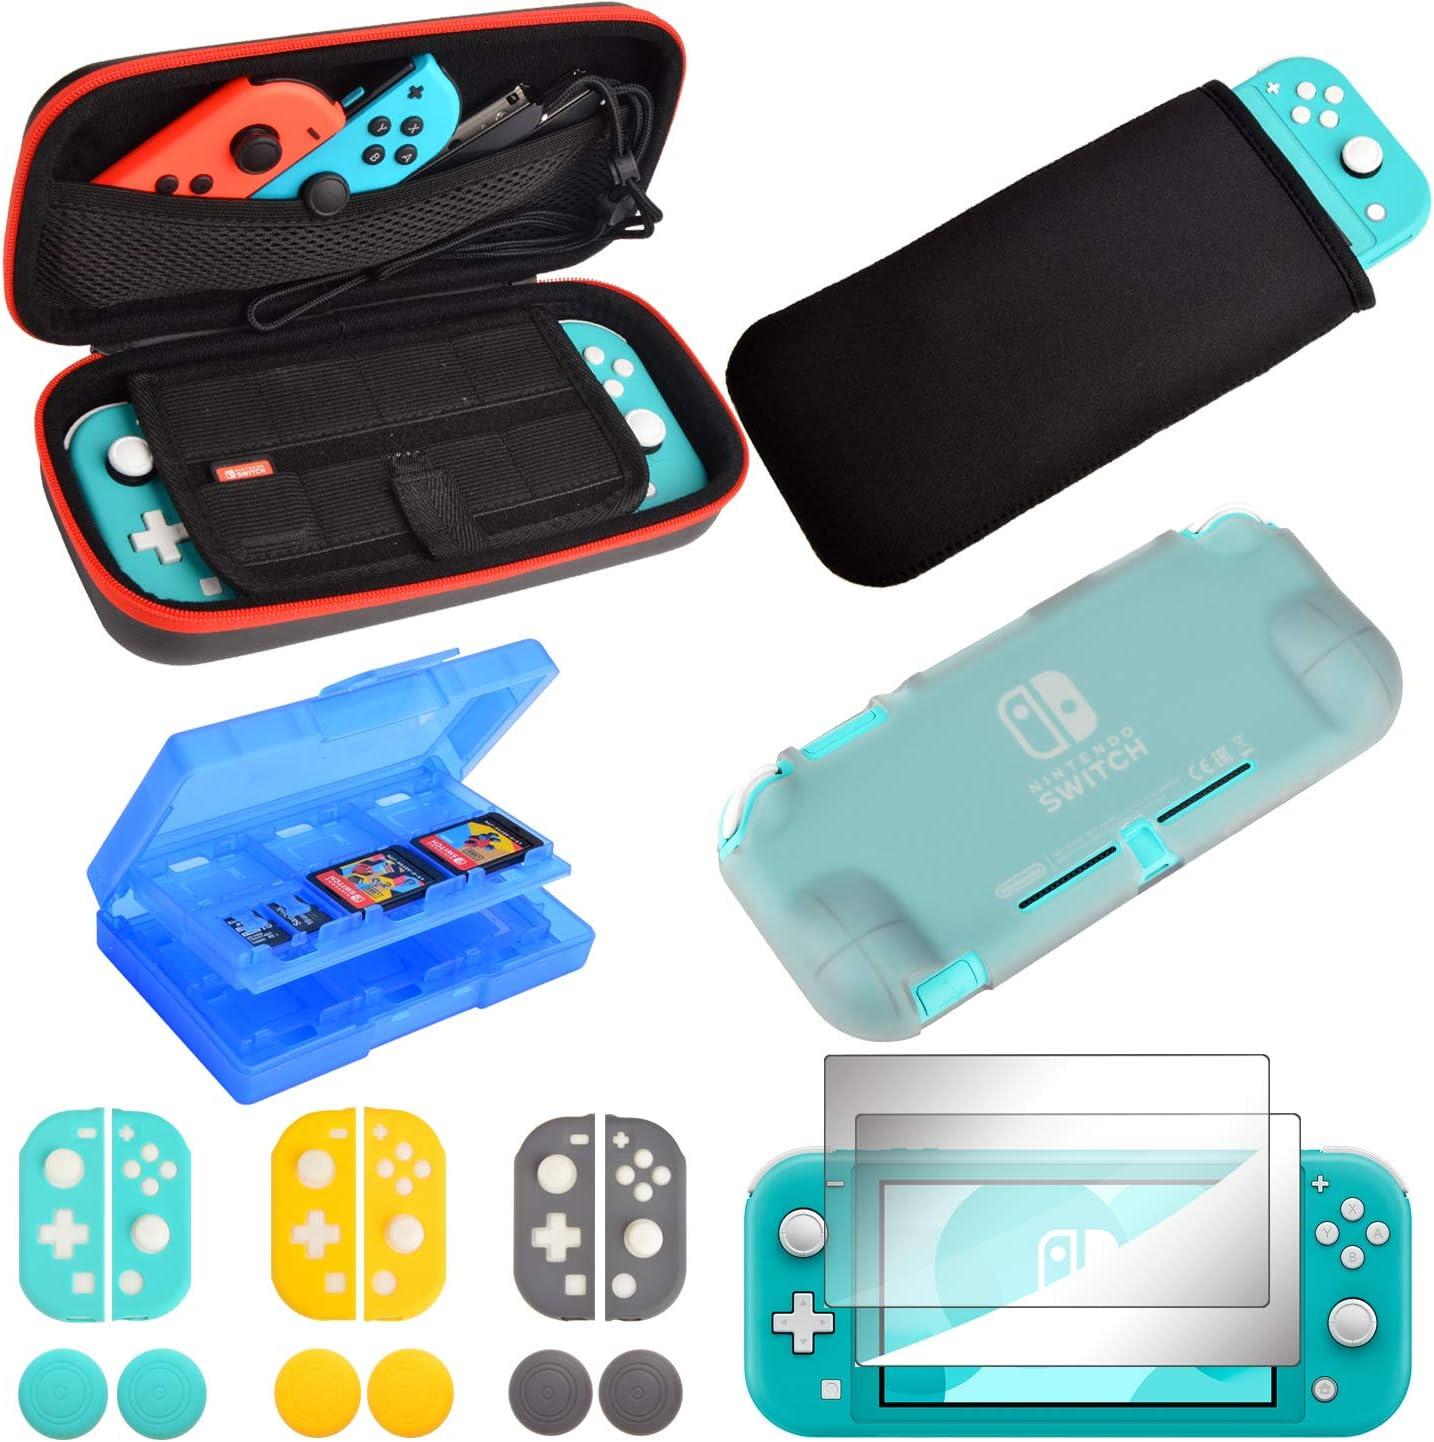 Kit de accesorios para Nintendo Switch Lite, funda de transporte ...